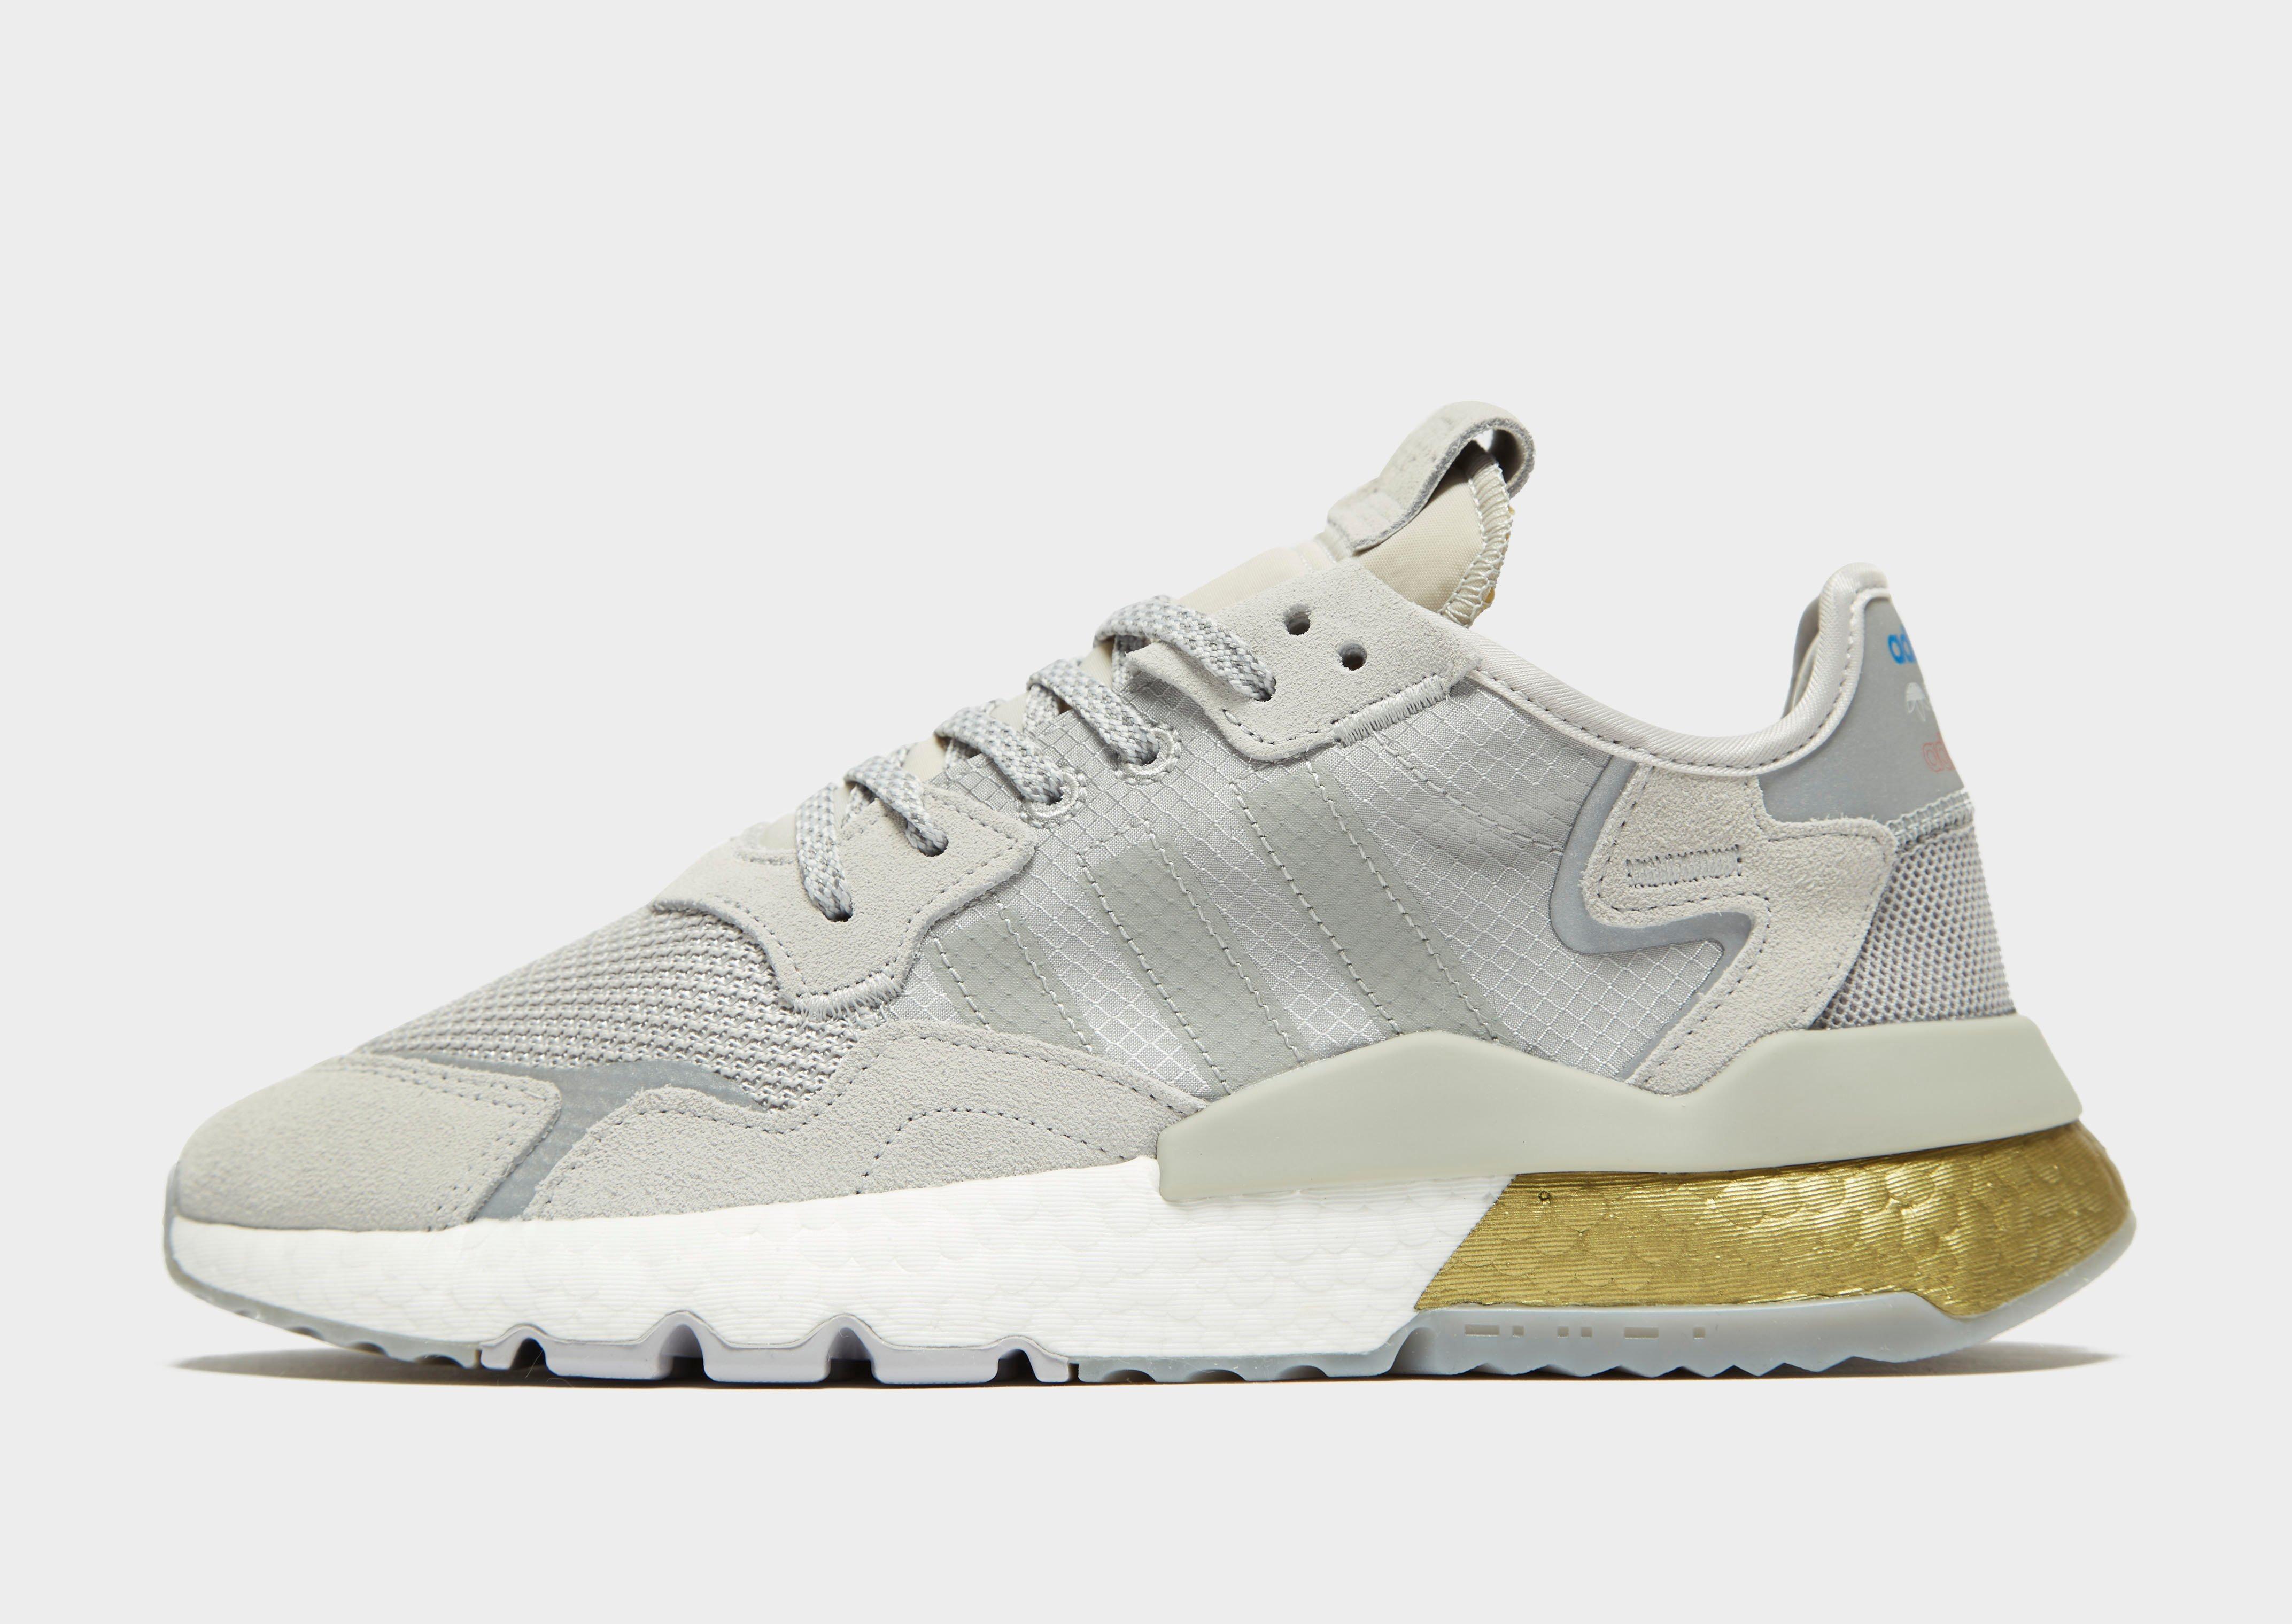 2019 Rabatt Adidas Nizza Shoes Herr Originals recensioner